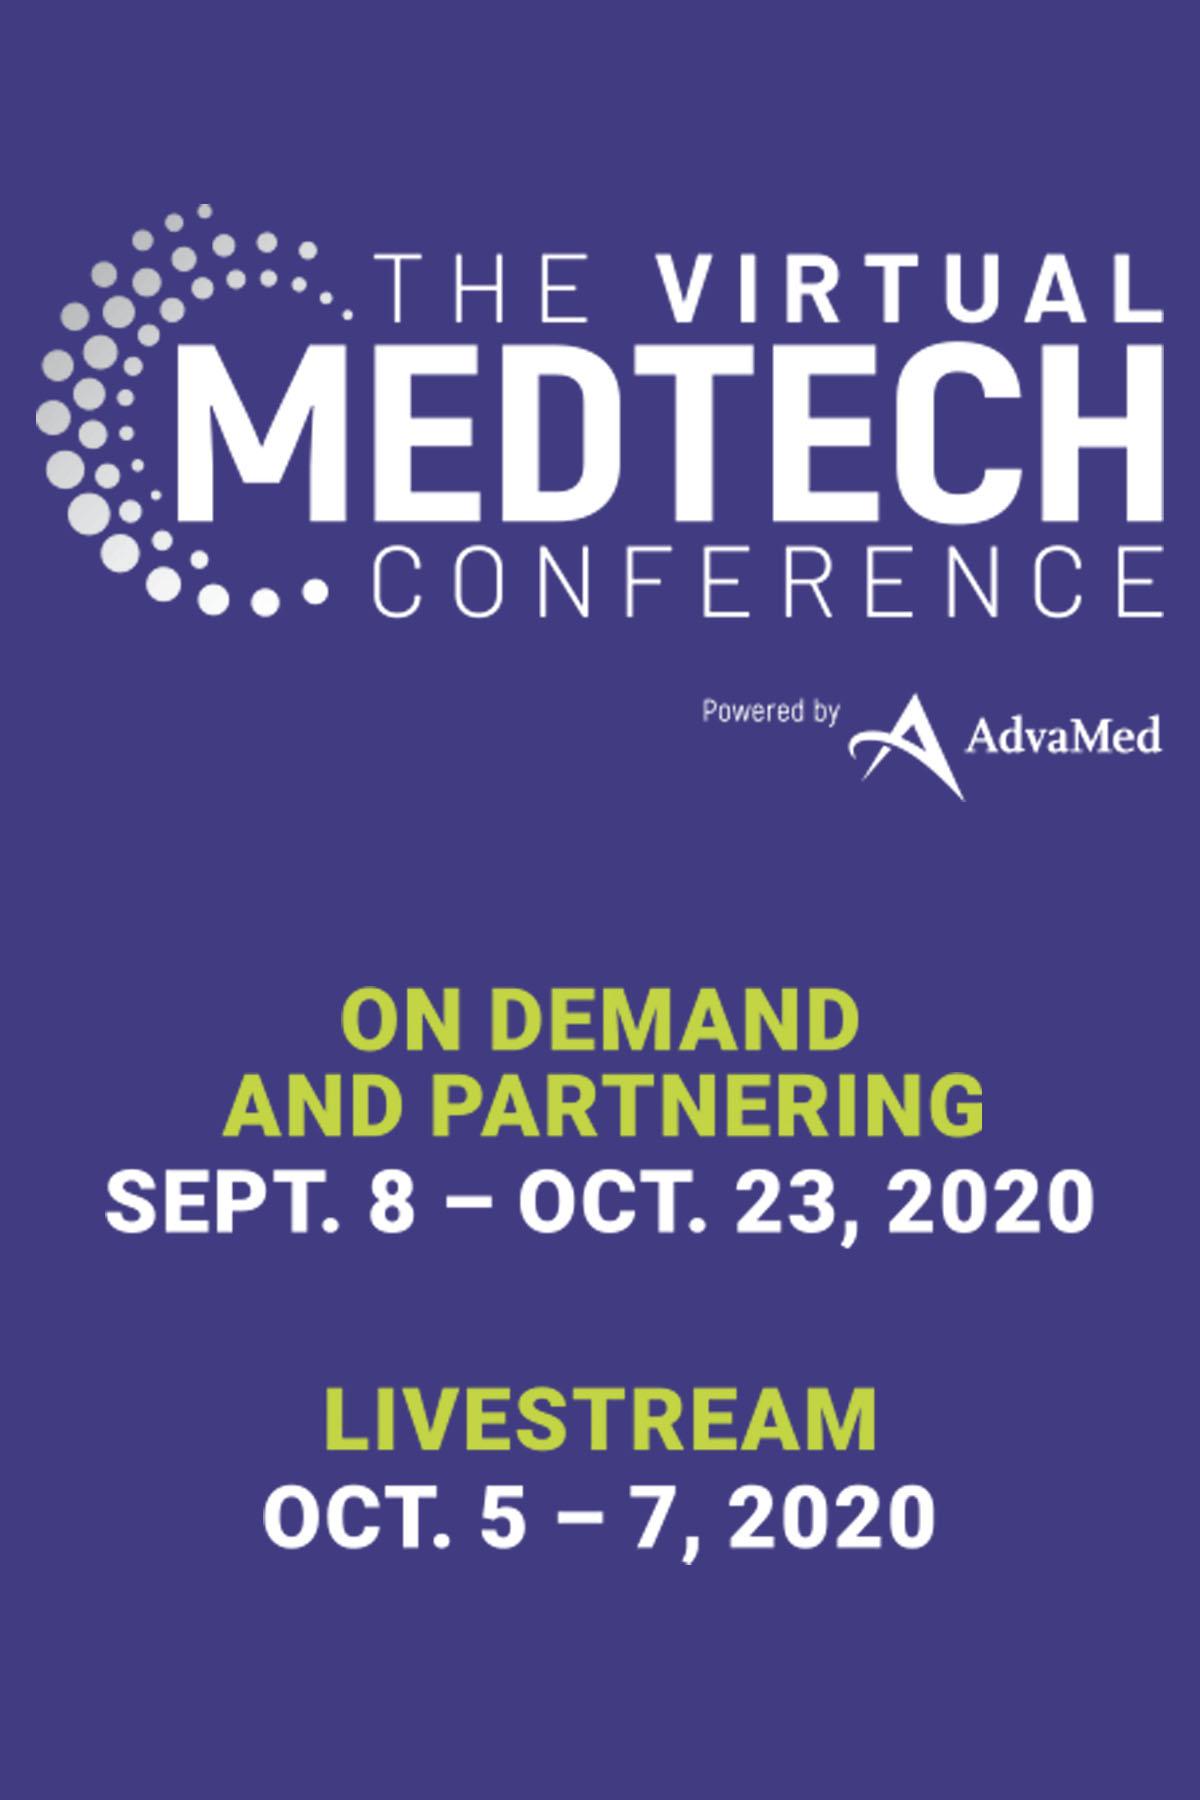 The MedTech Virtual Conference: On demand Partnering September 8- Oct 23, 2020; Livestream October 5-7, 2020